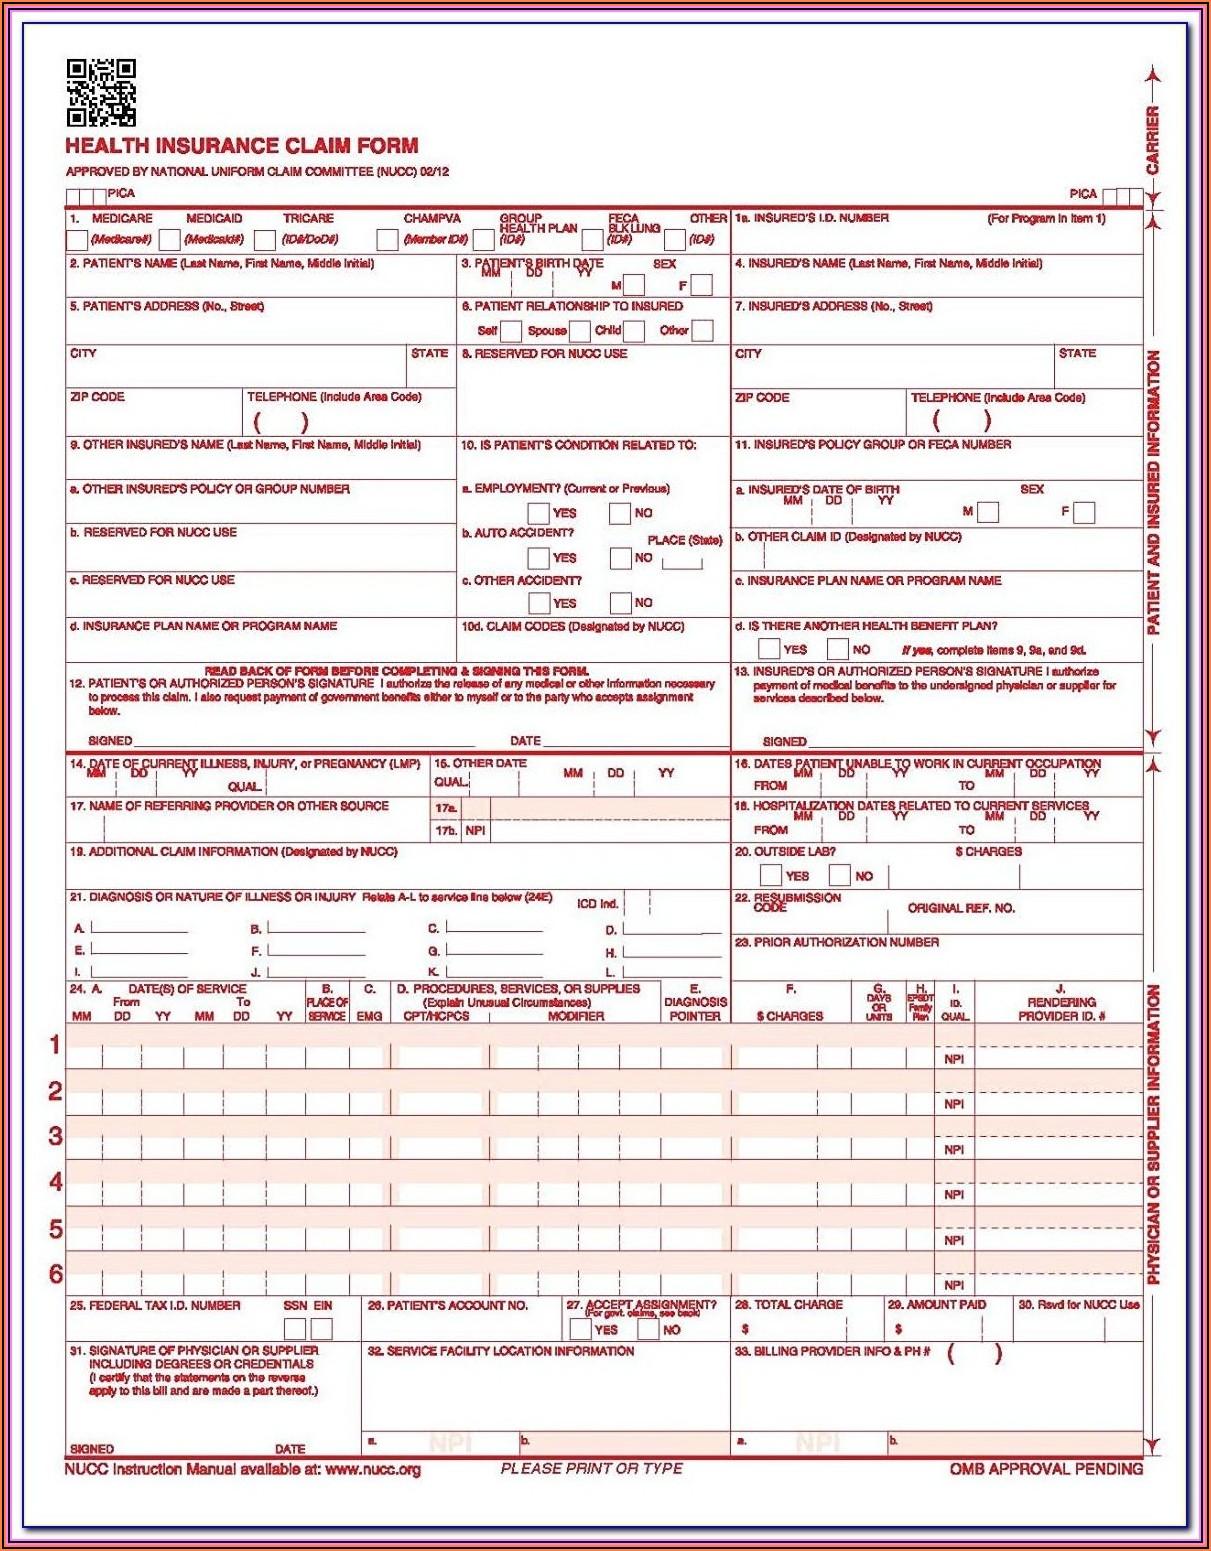 Nucc Cms 1500 Claim Form Instructions